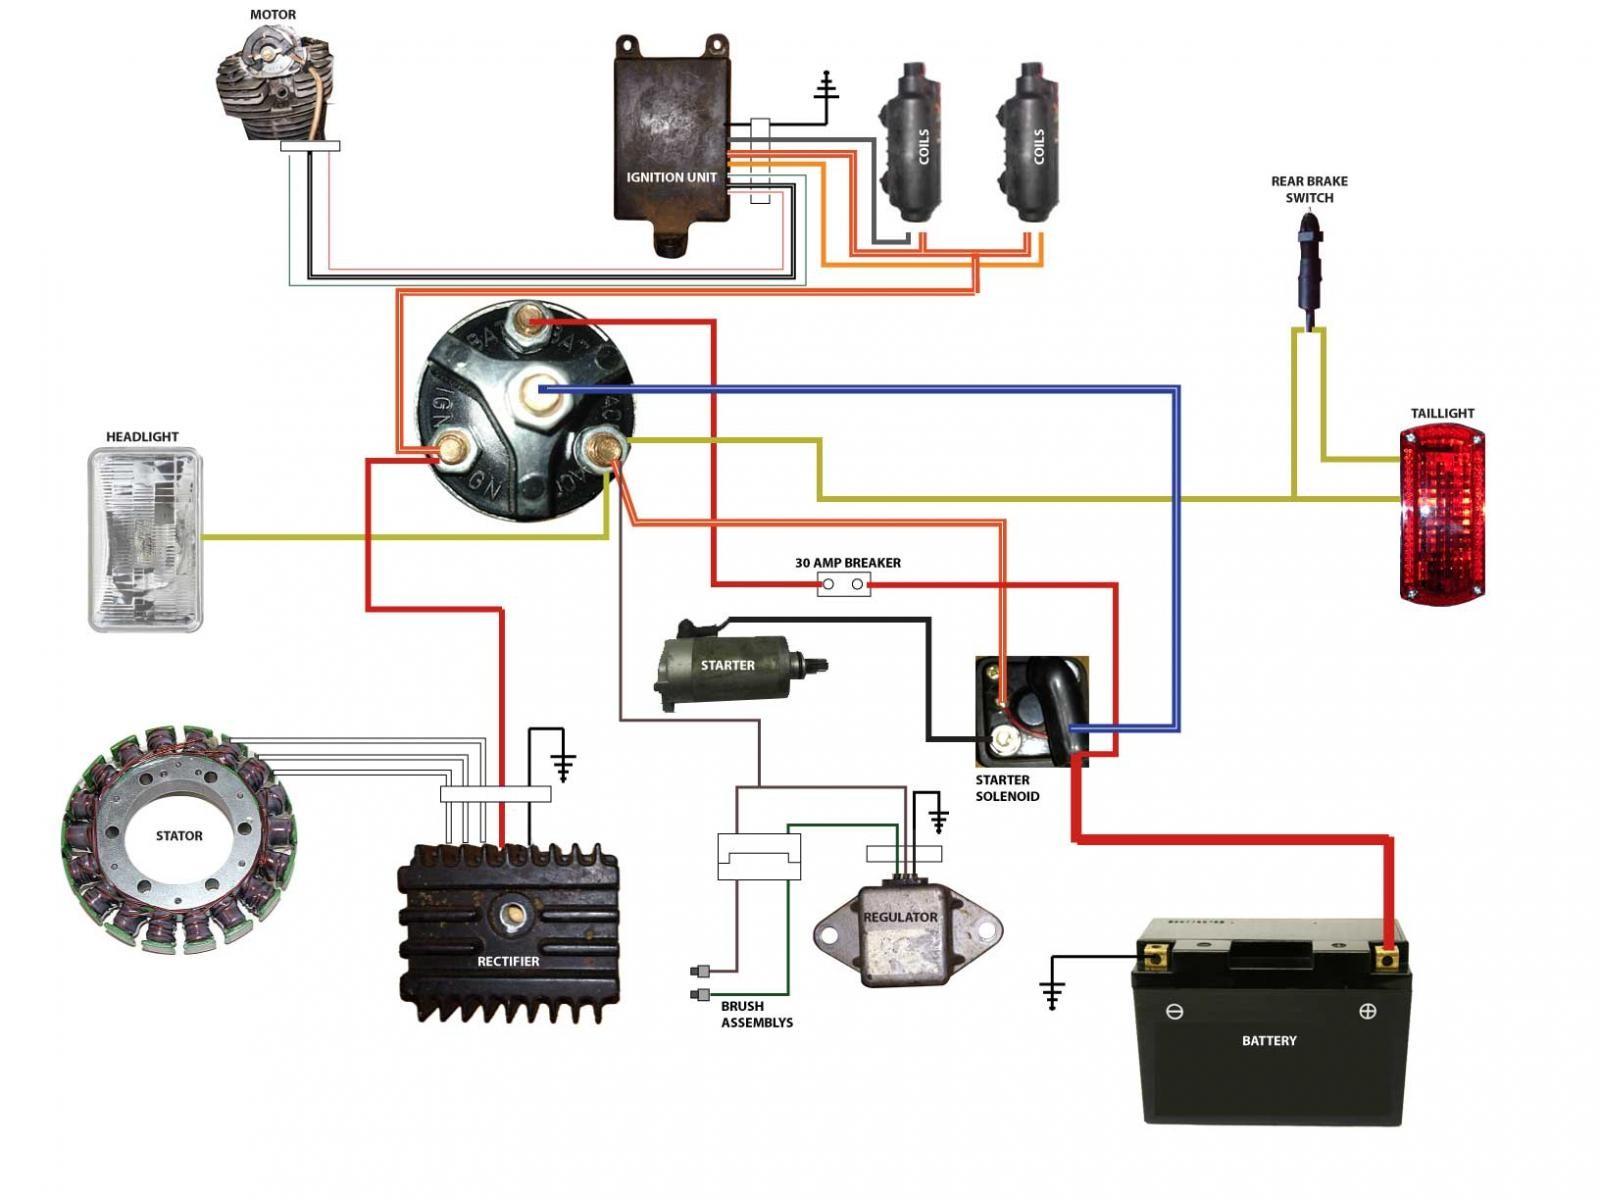 Honda Cb750 Chopper Wiring Diagram Schematics Diagrams Engine Bobber Enthusiast U2022 Bsa